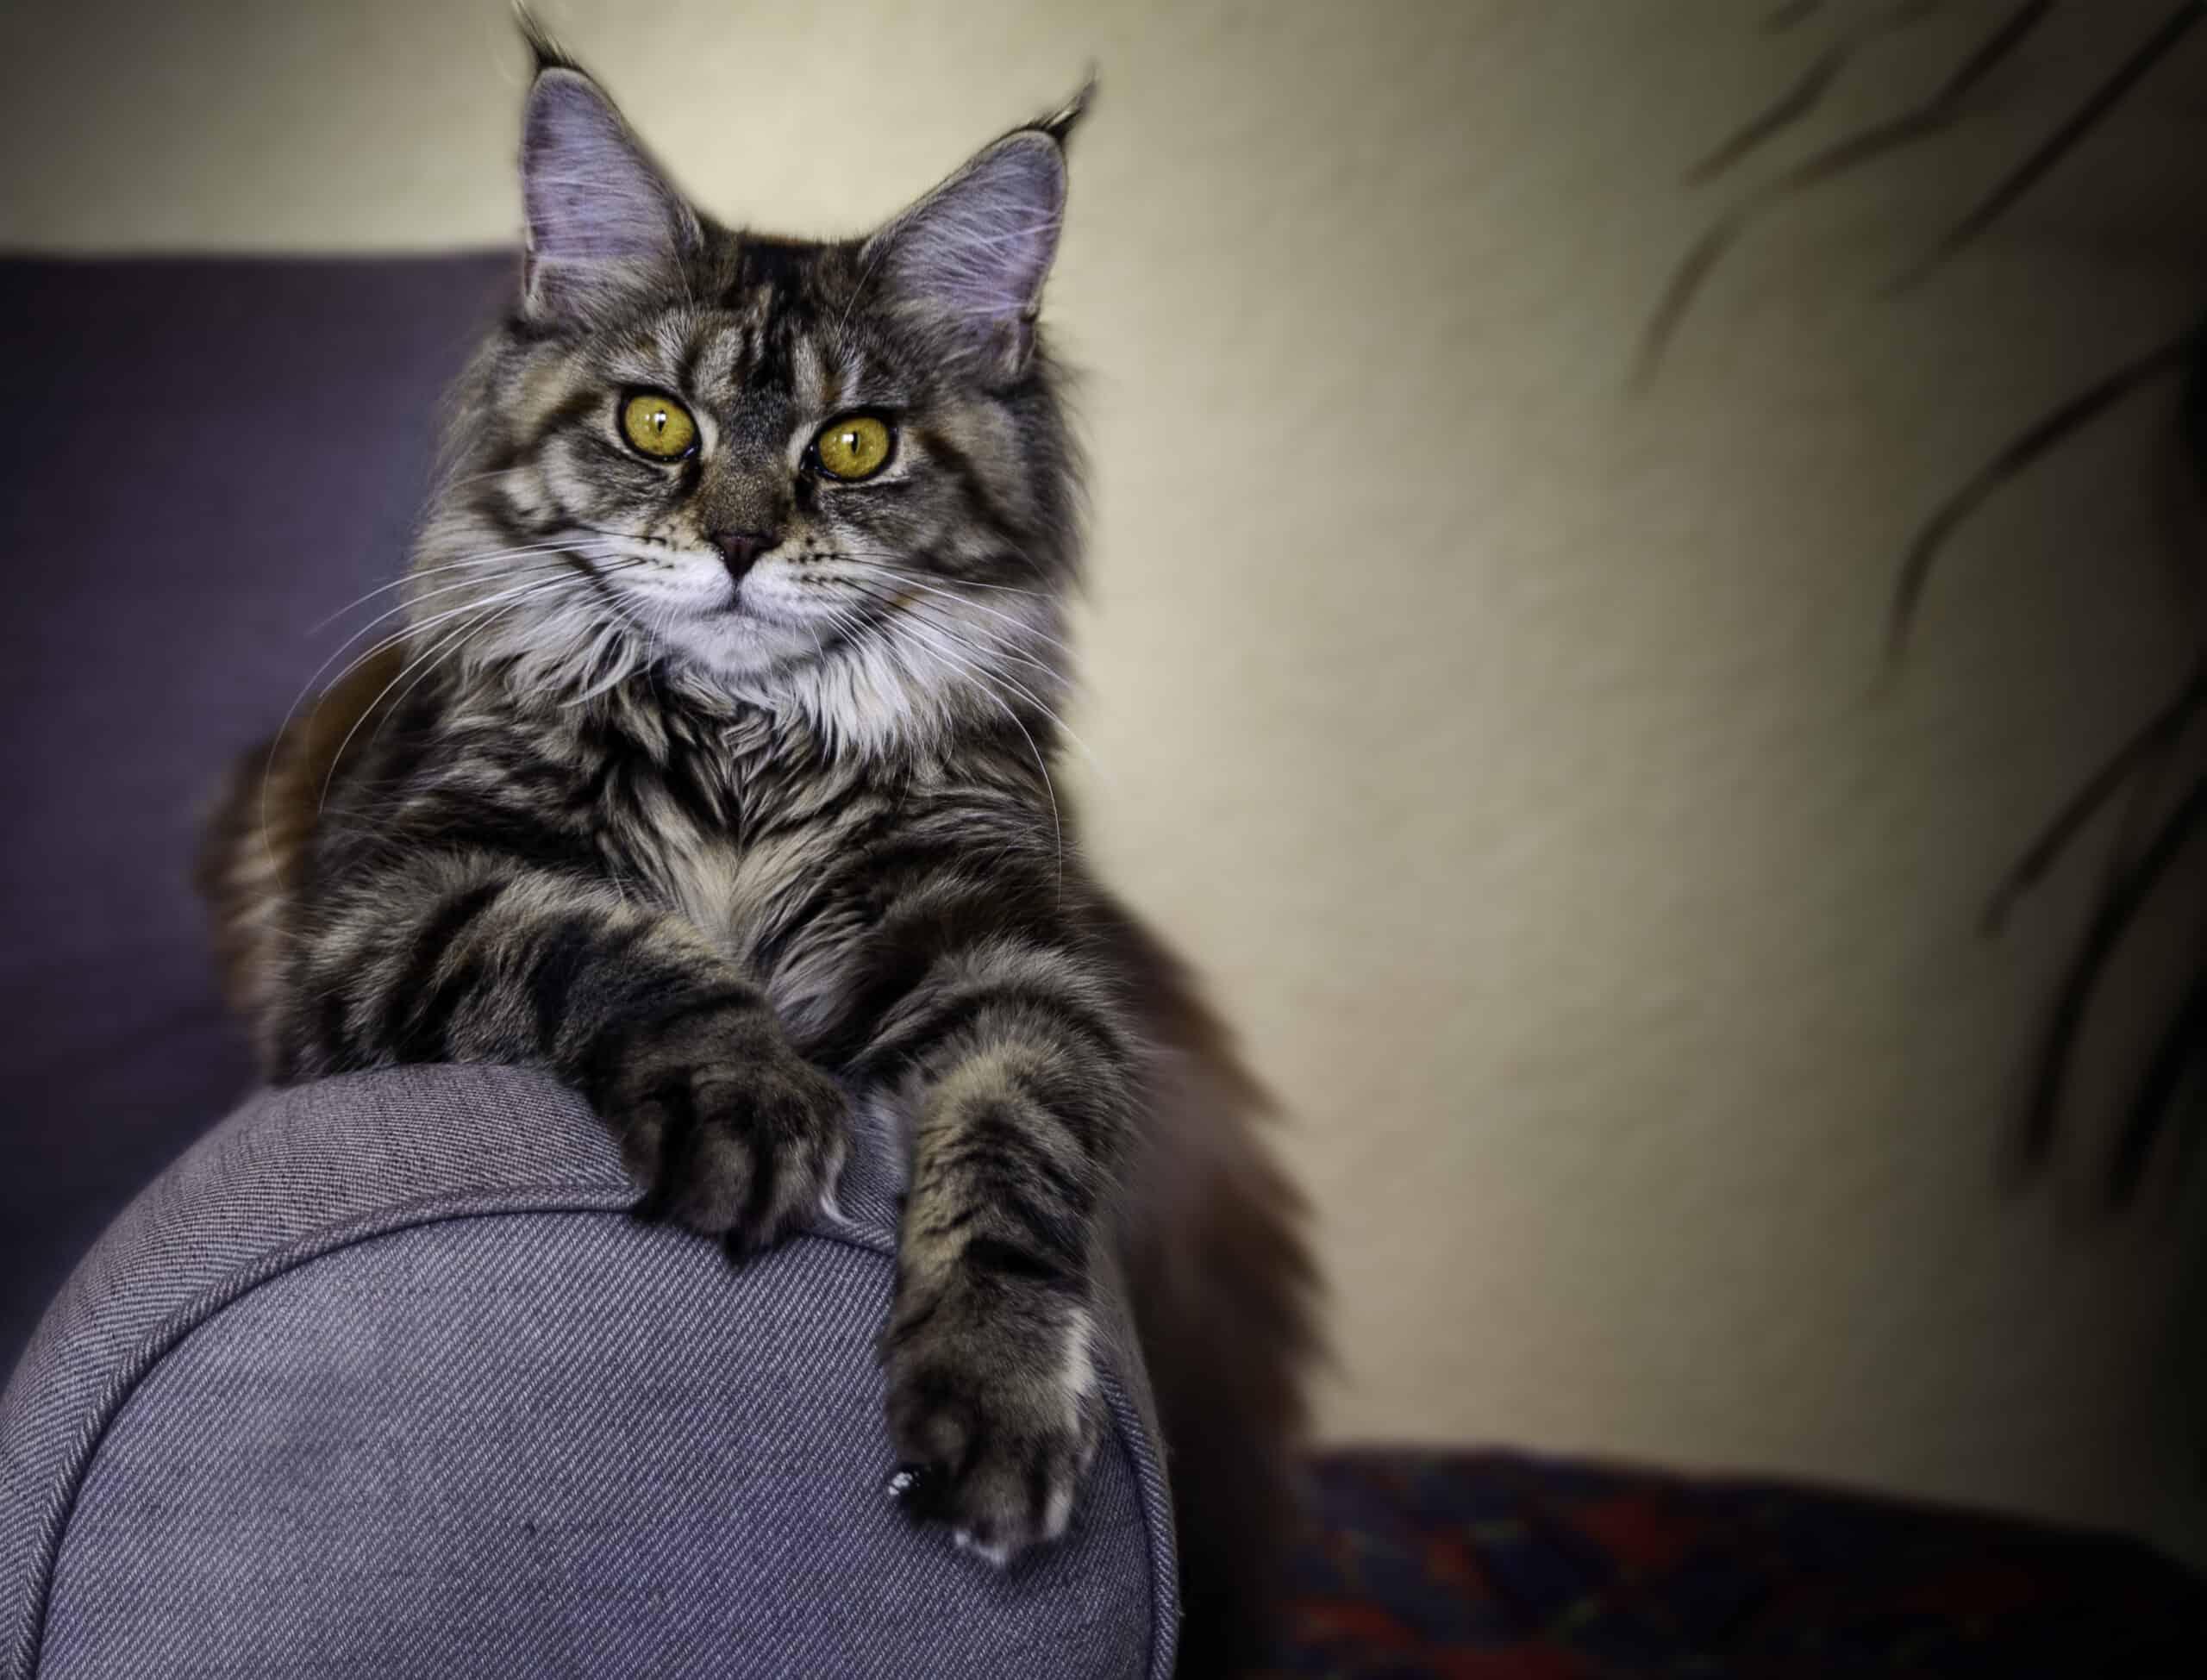 can cats sense good people